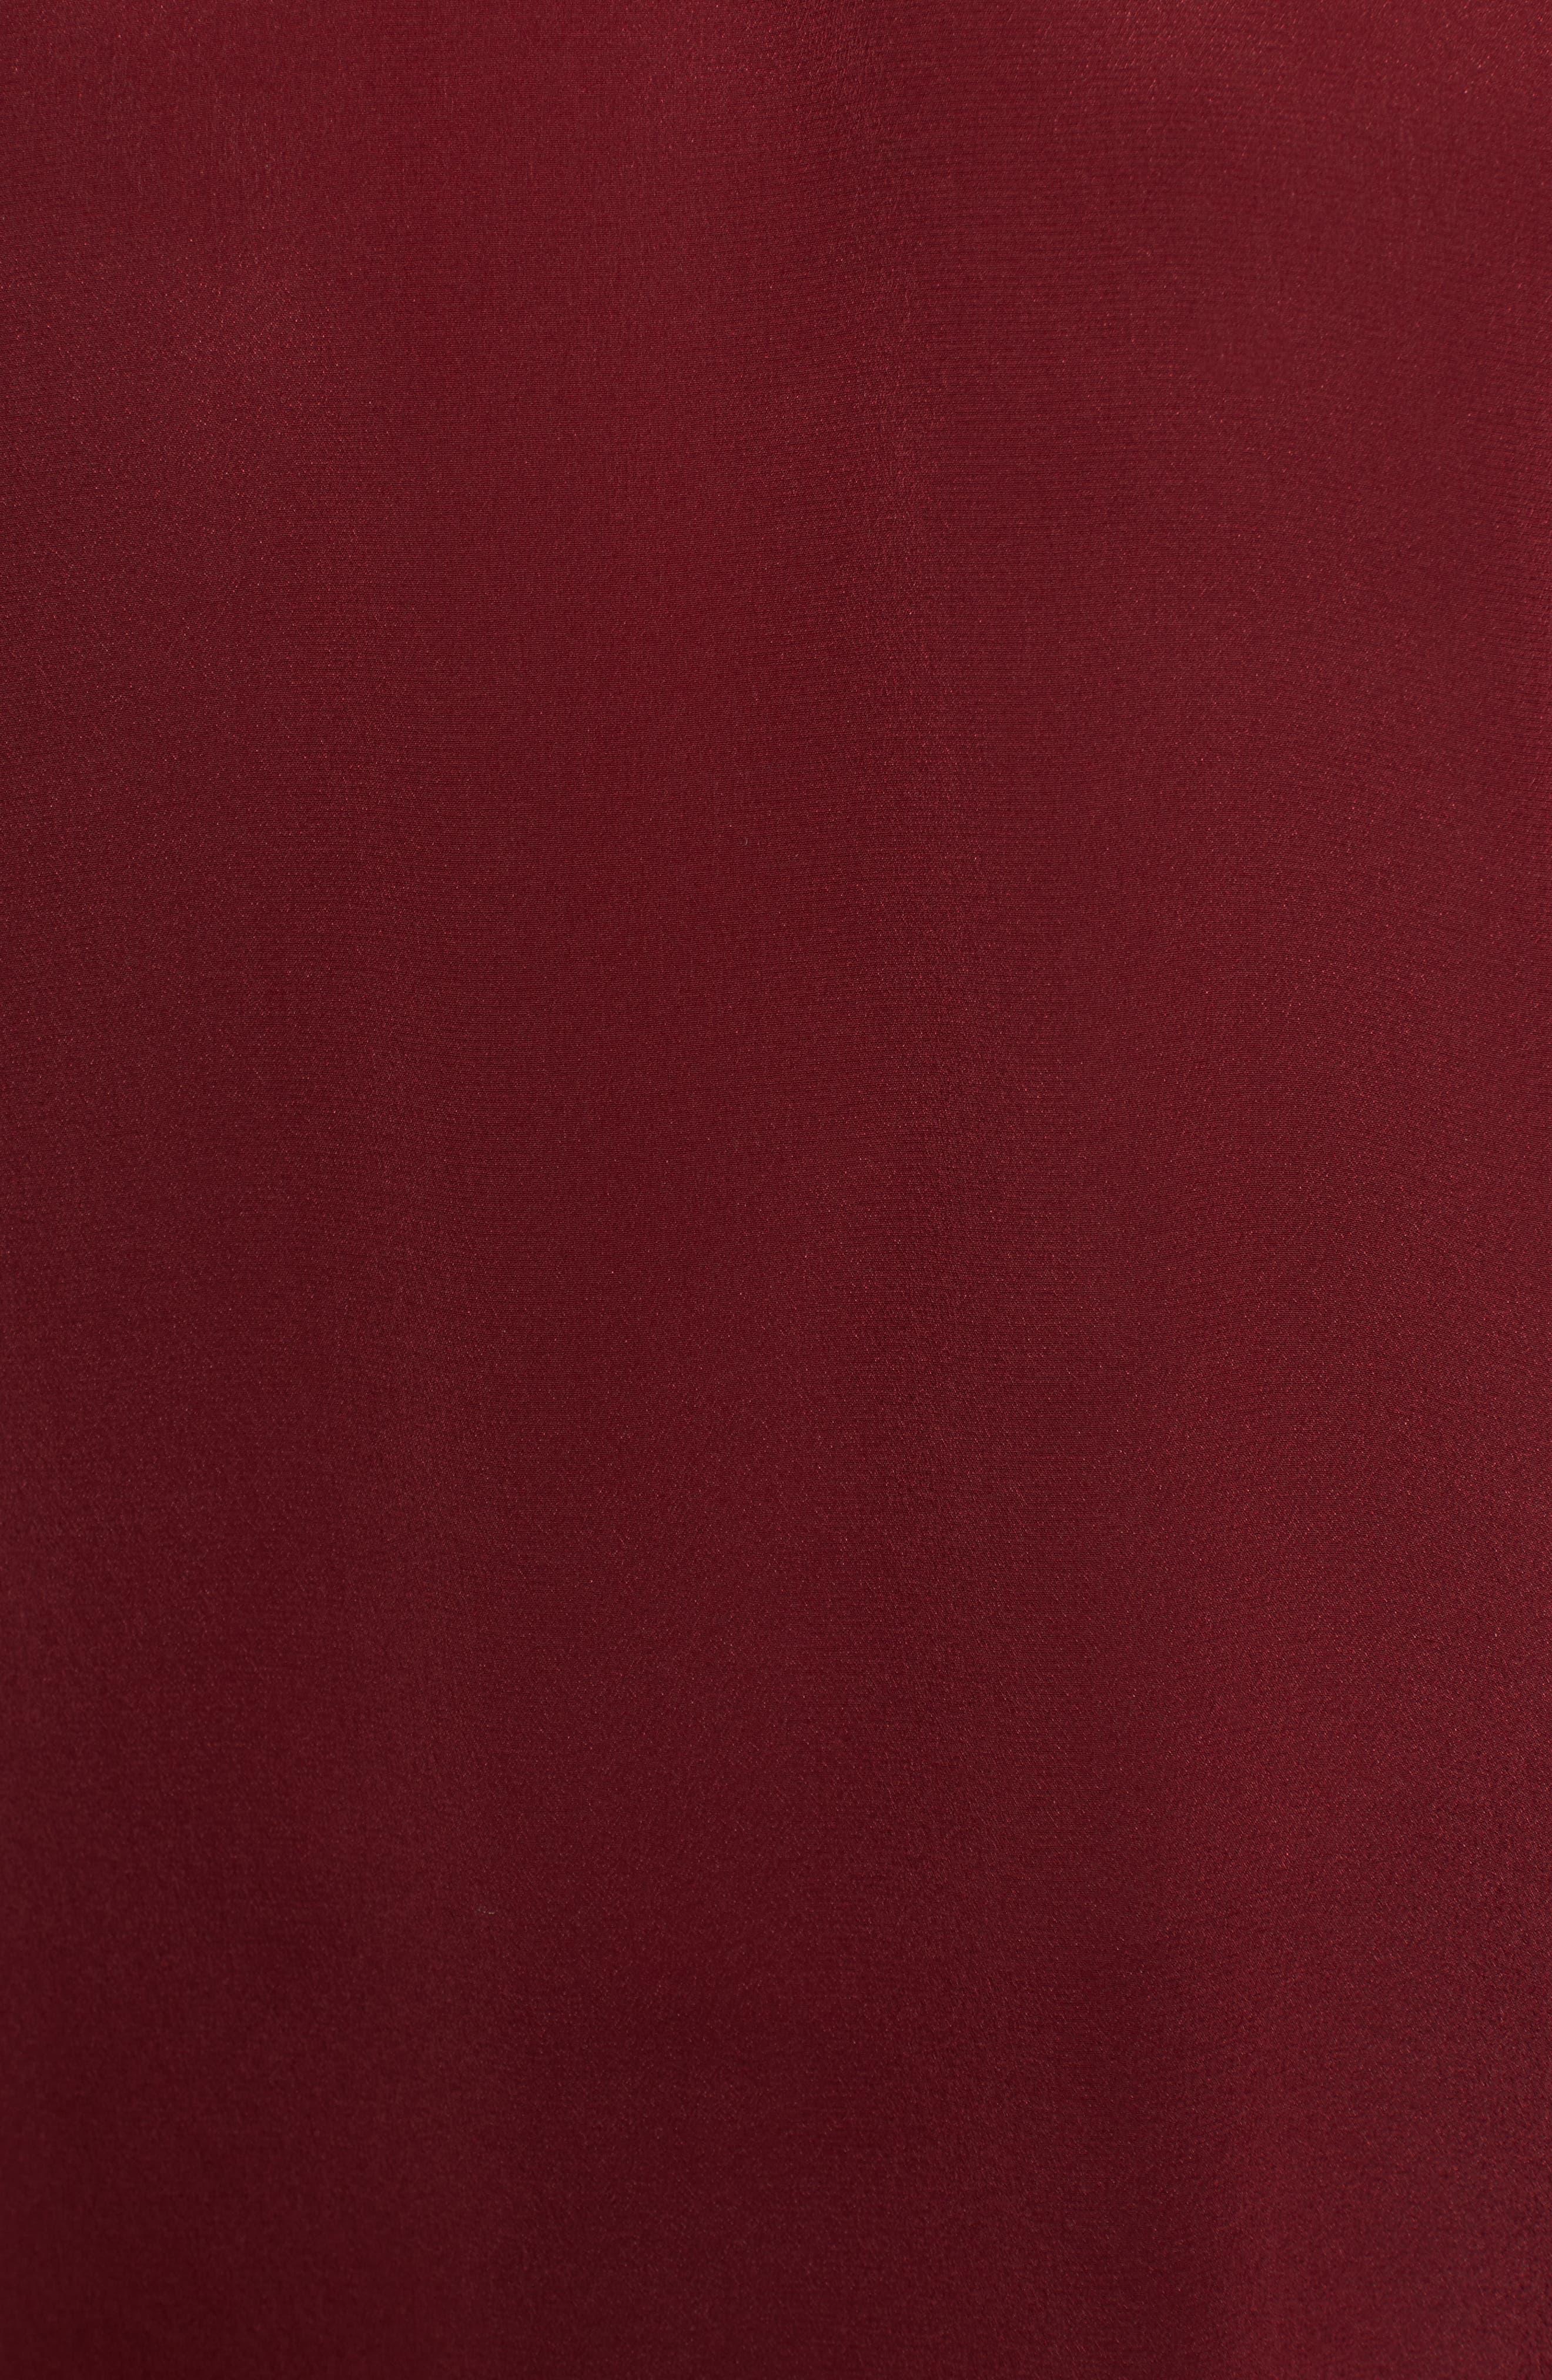 Ruffle Sleeve Silk Top,                             Alternate thumbnail 5, color,                             930